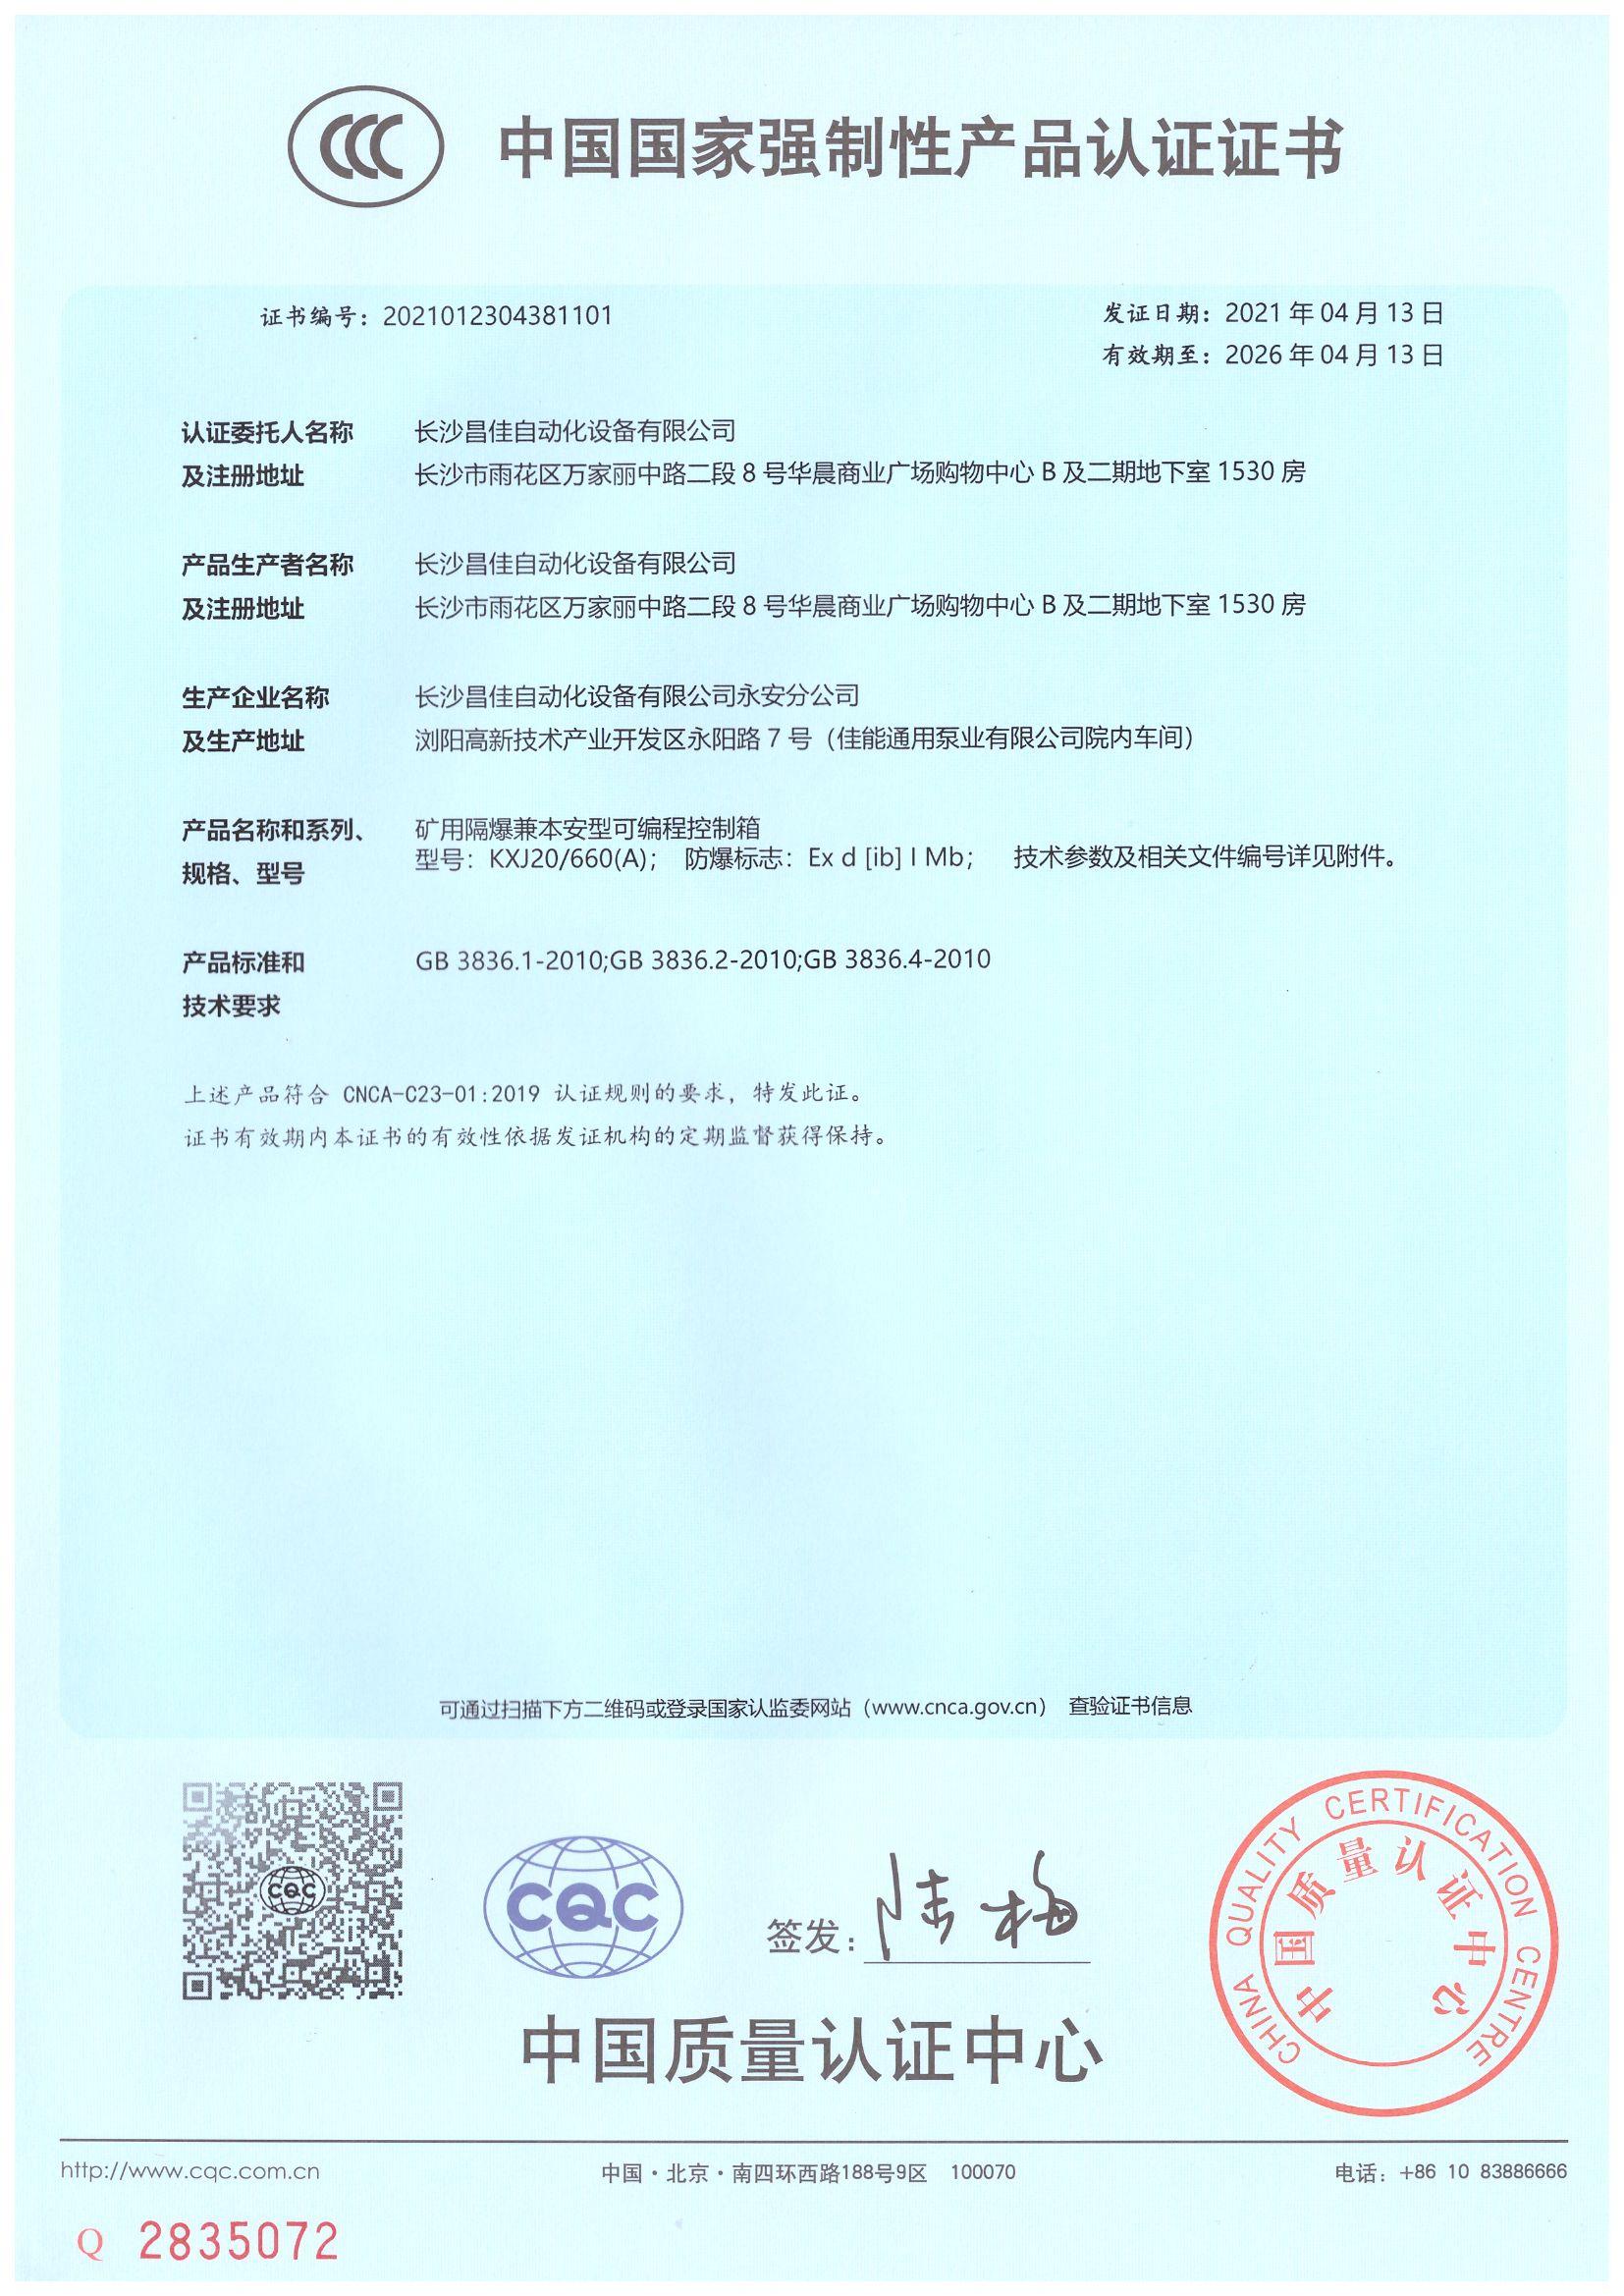 KXJ20 660矿用隔爆兼本安型可编程控制箱 防爆CCC证